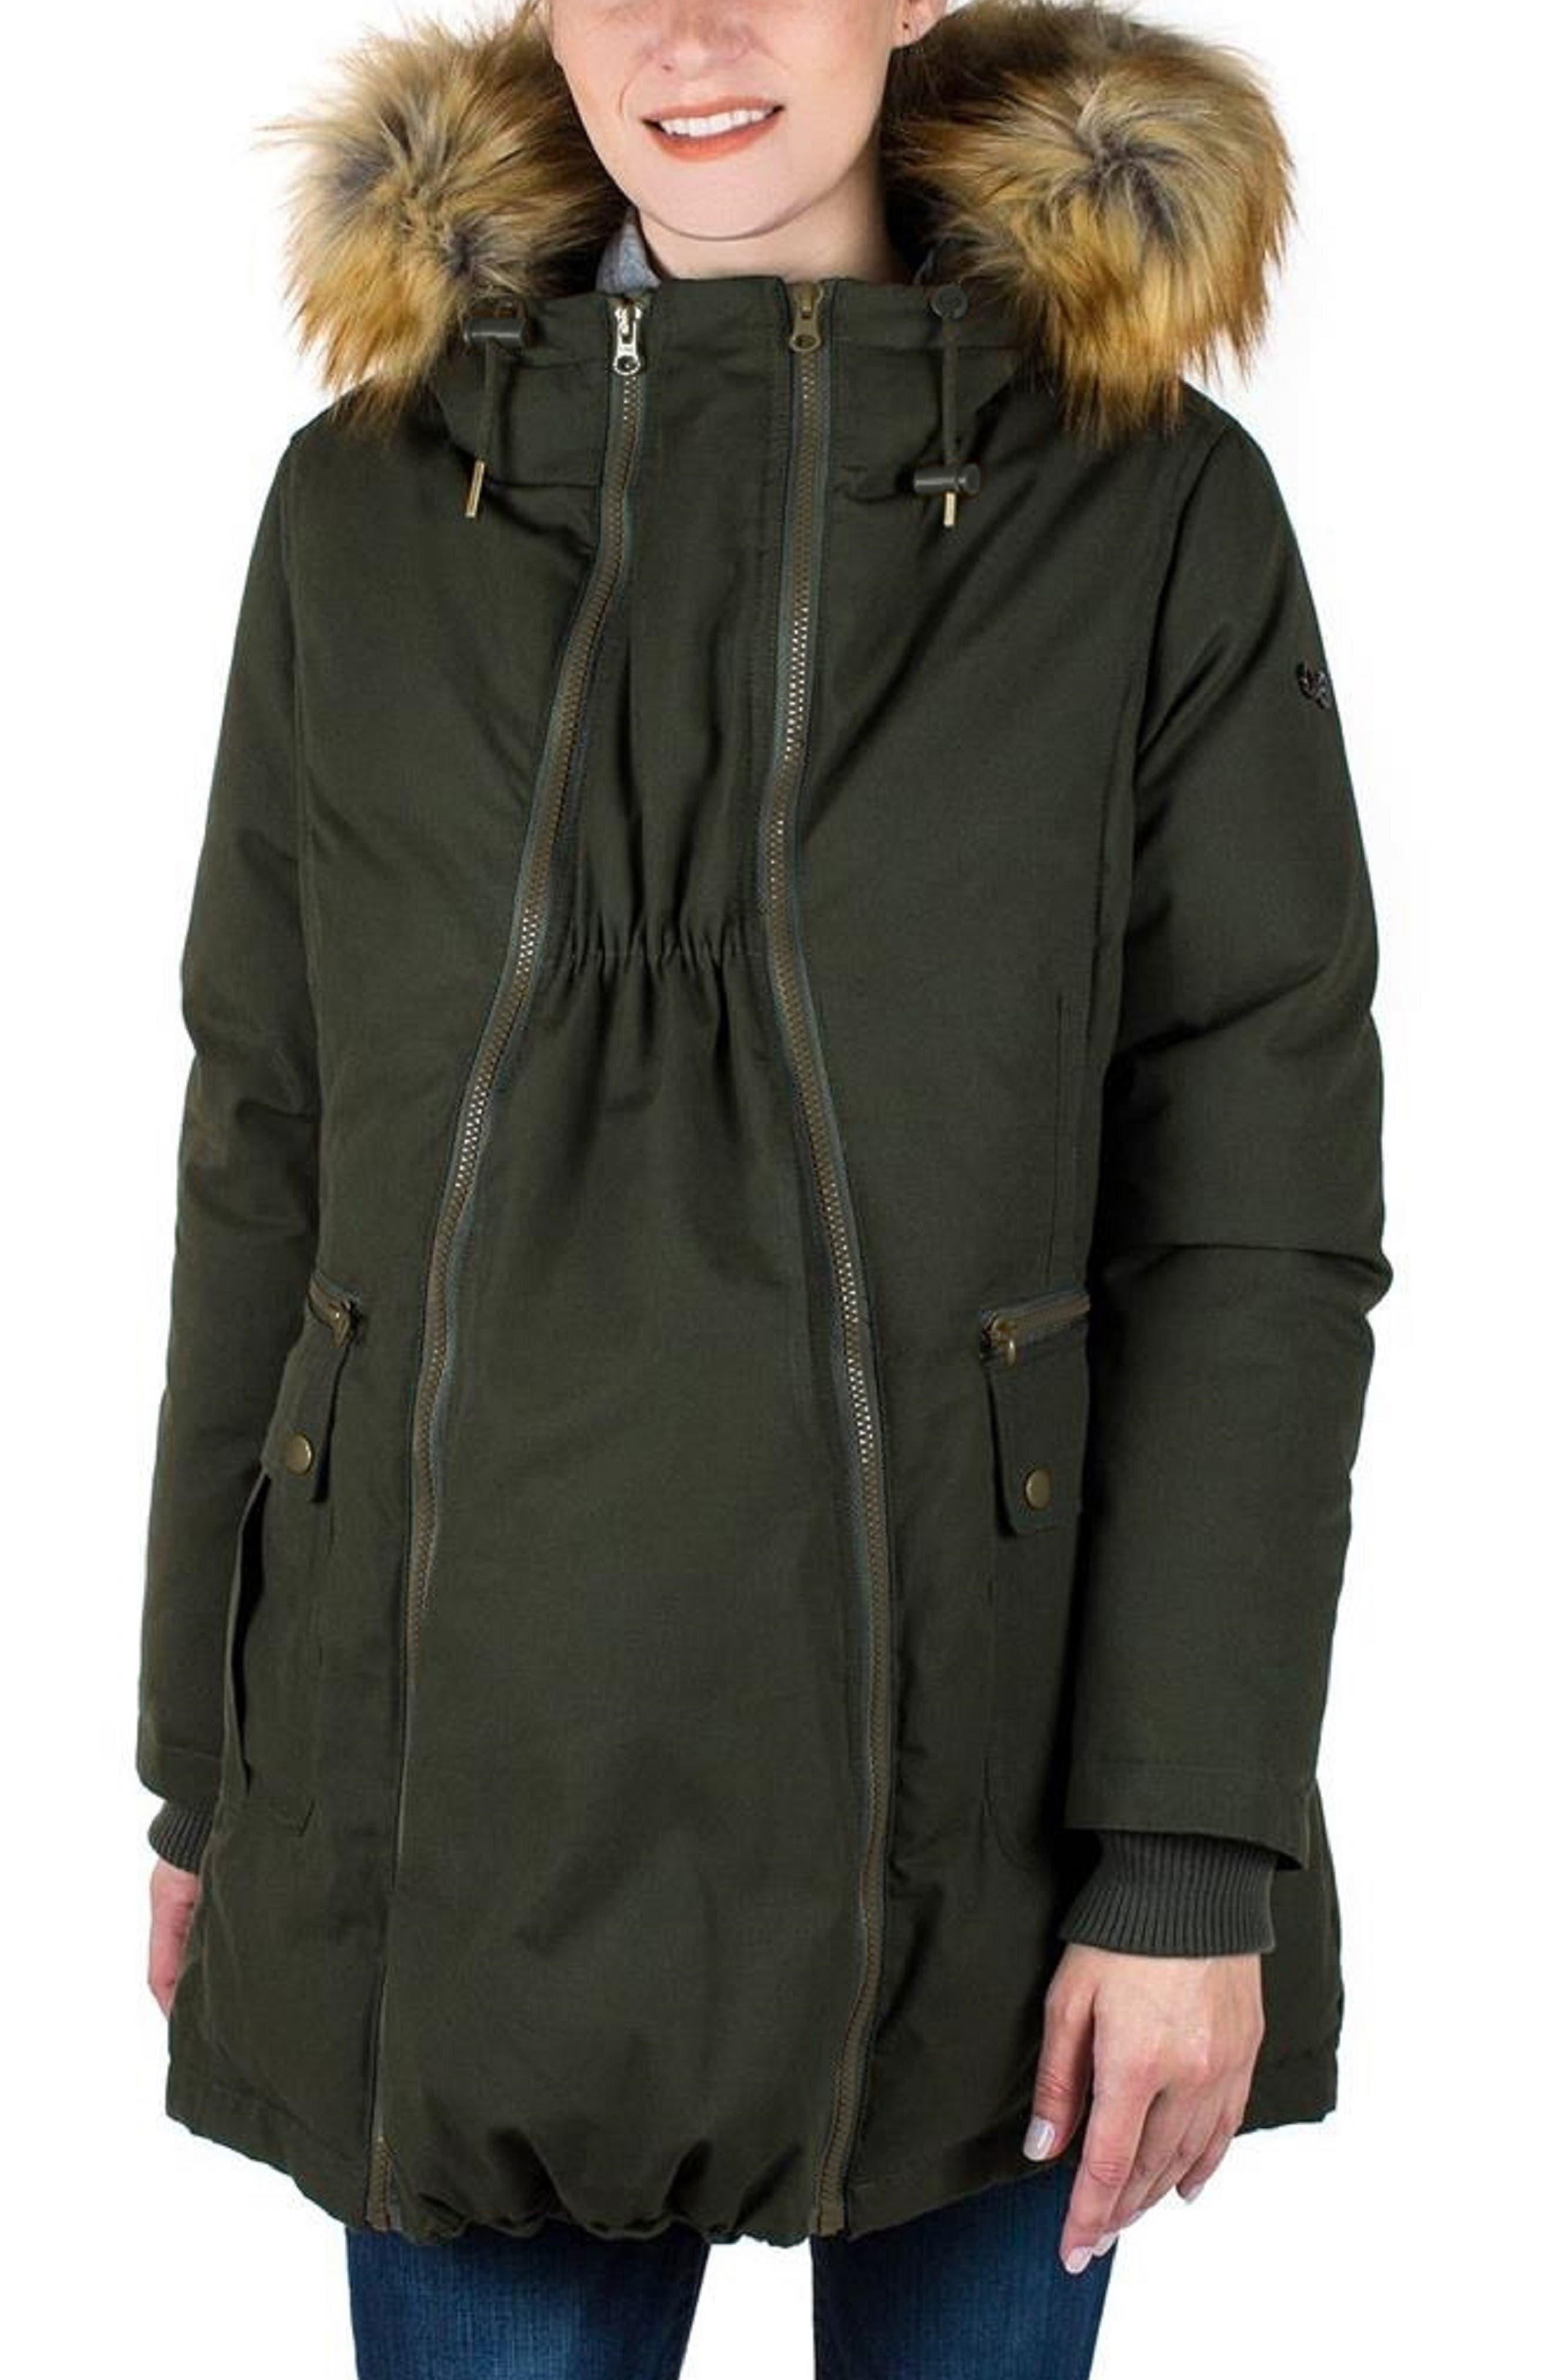 Convertible Down 3-in-1 Maternity Jacket,                         Main,                         color, KHAKI GREEN